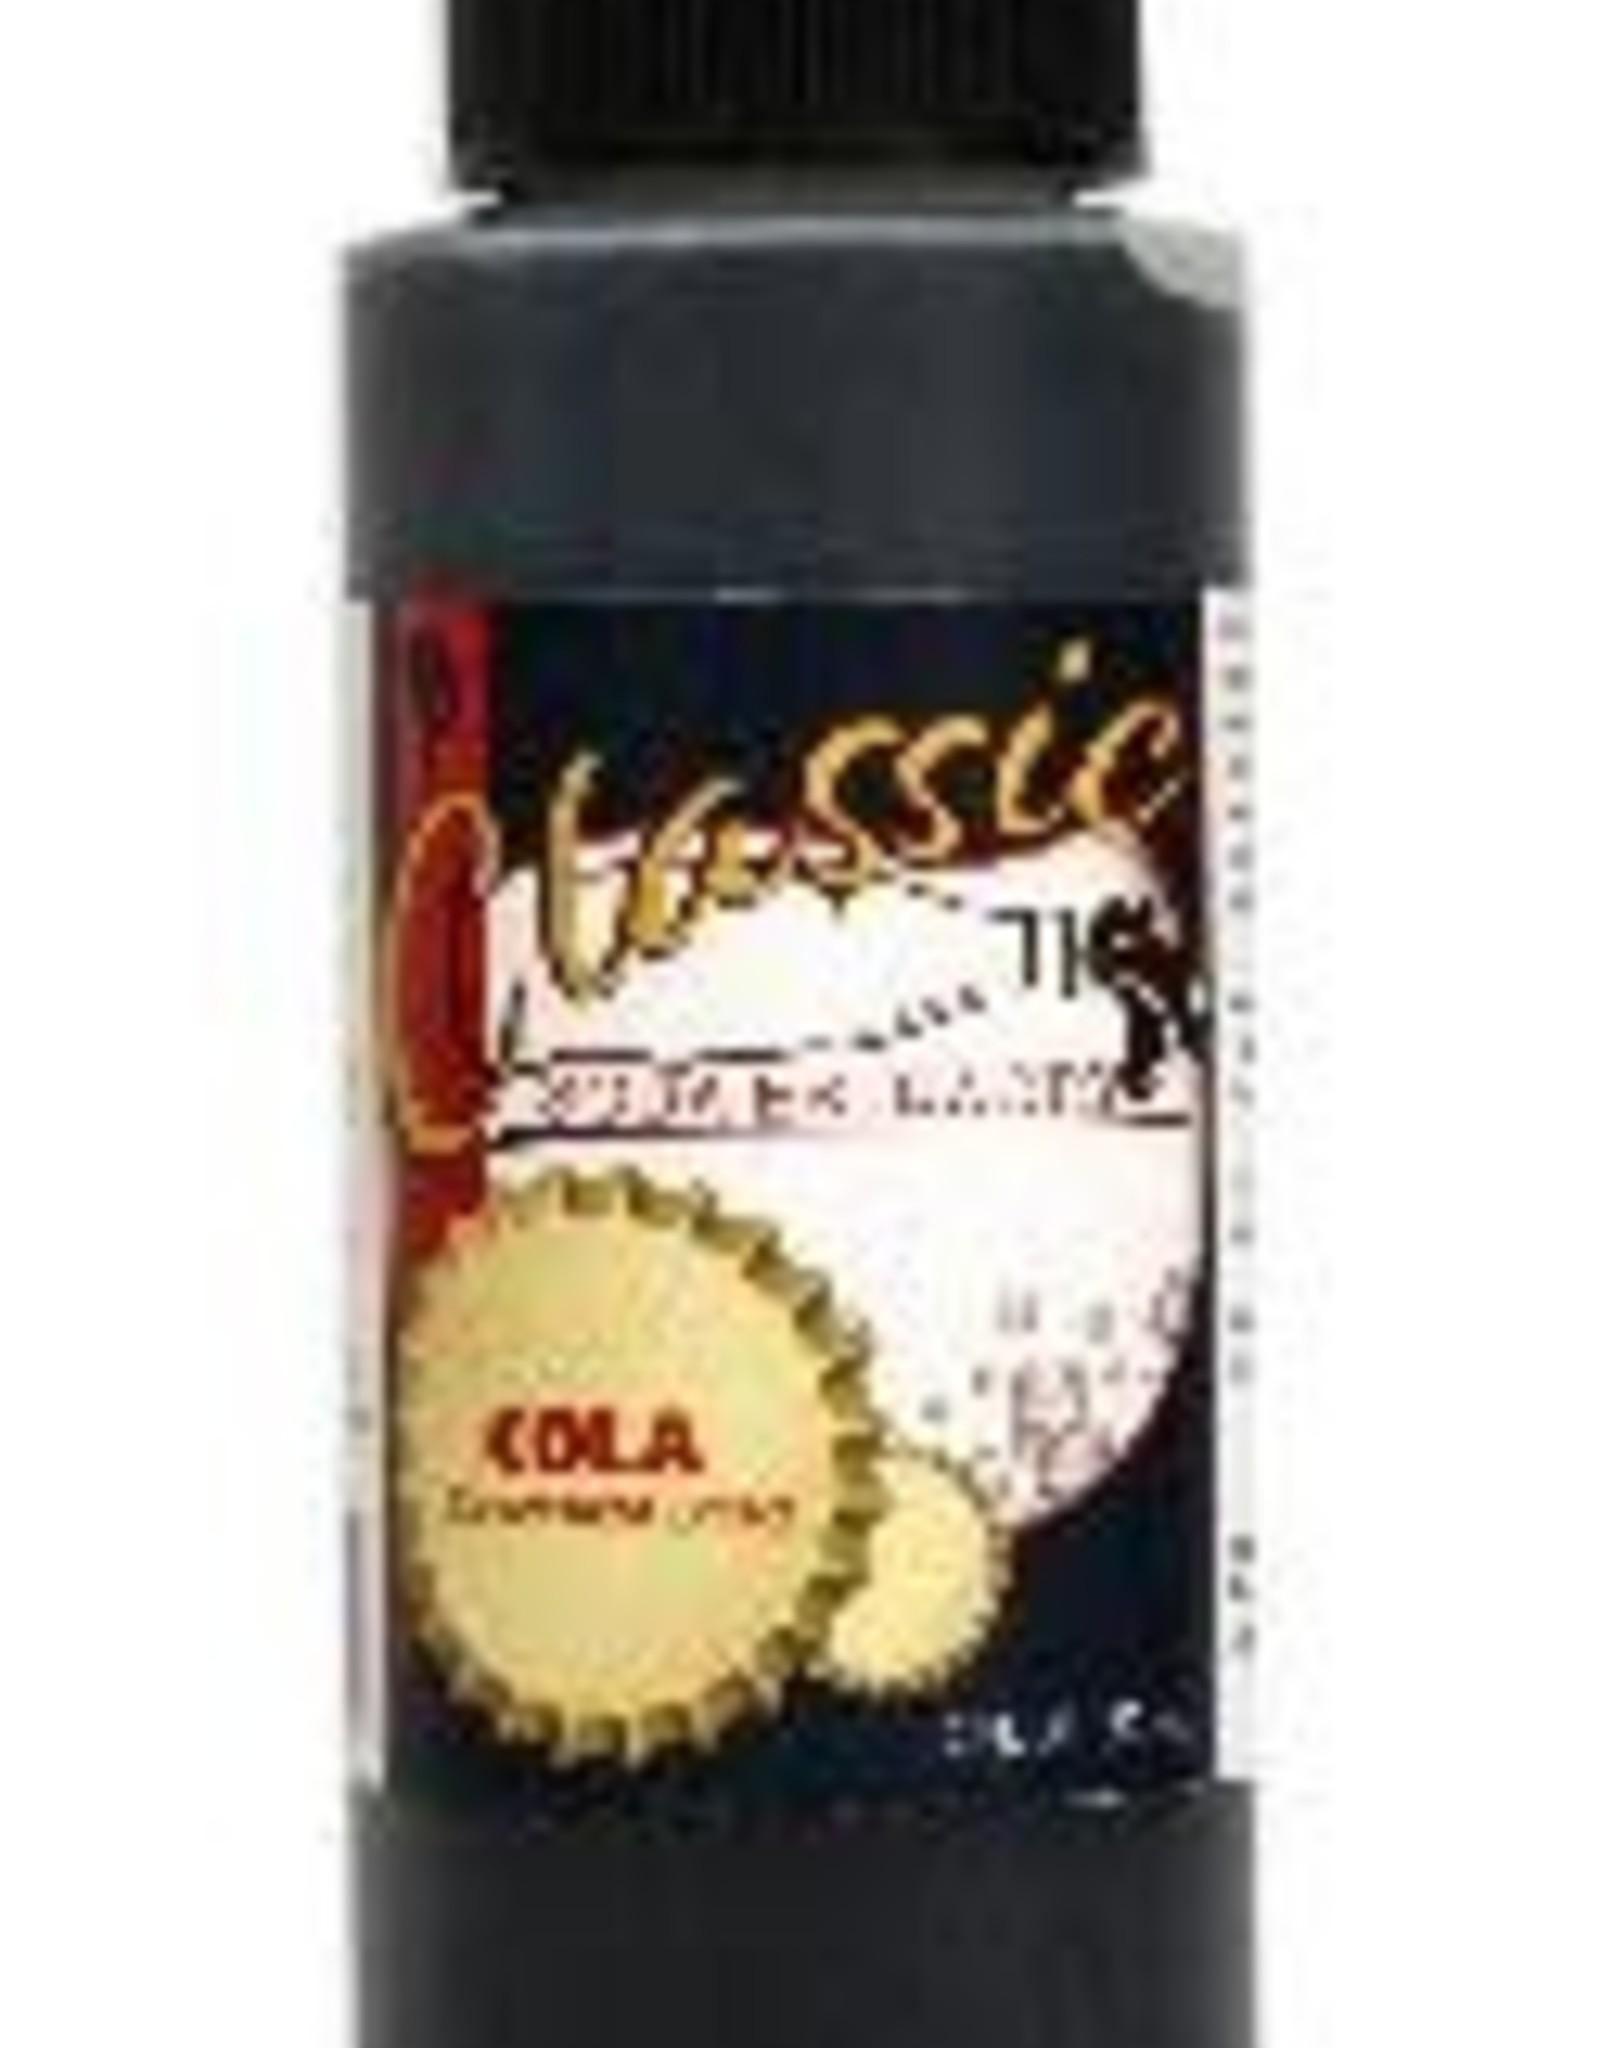 COLA SODA EXTRACT- 2 oz.